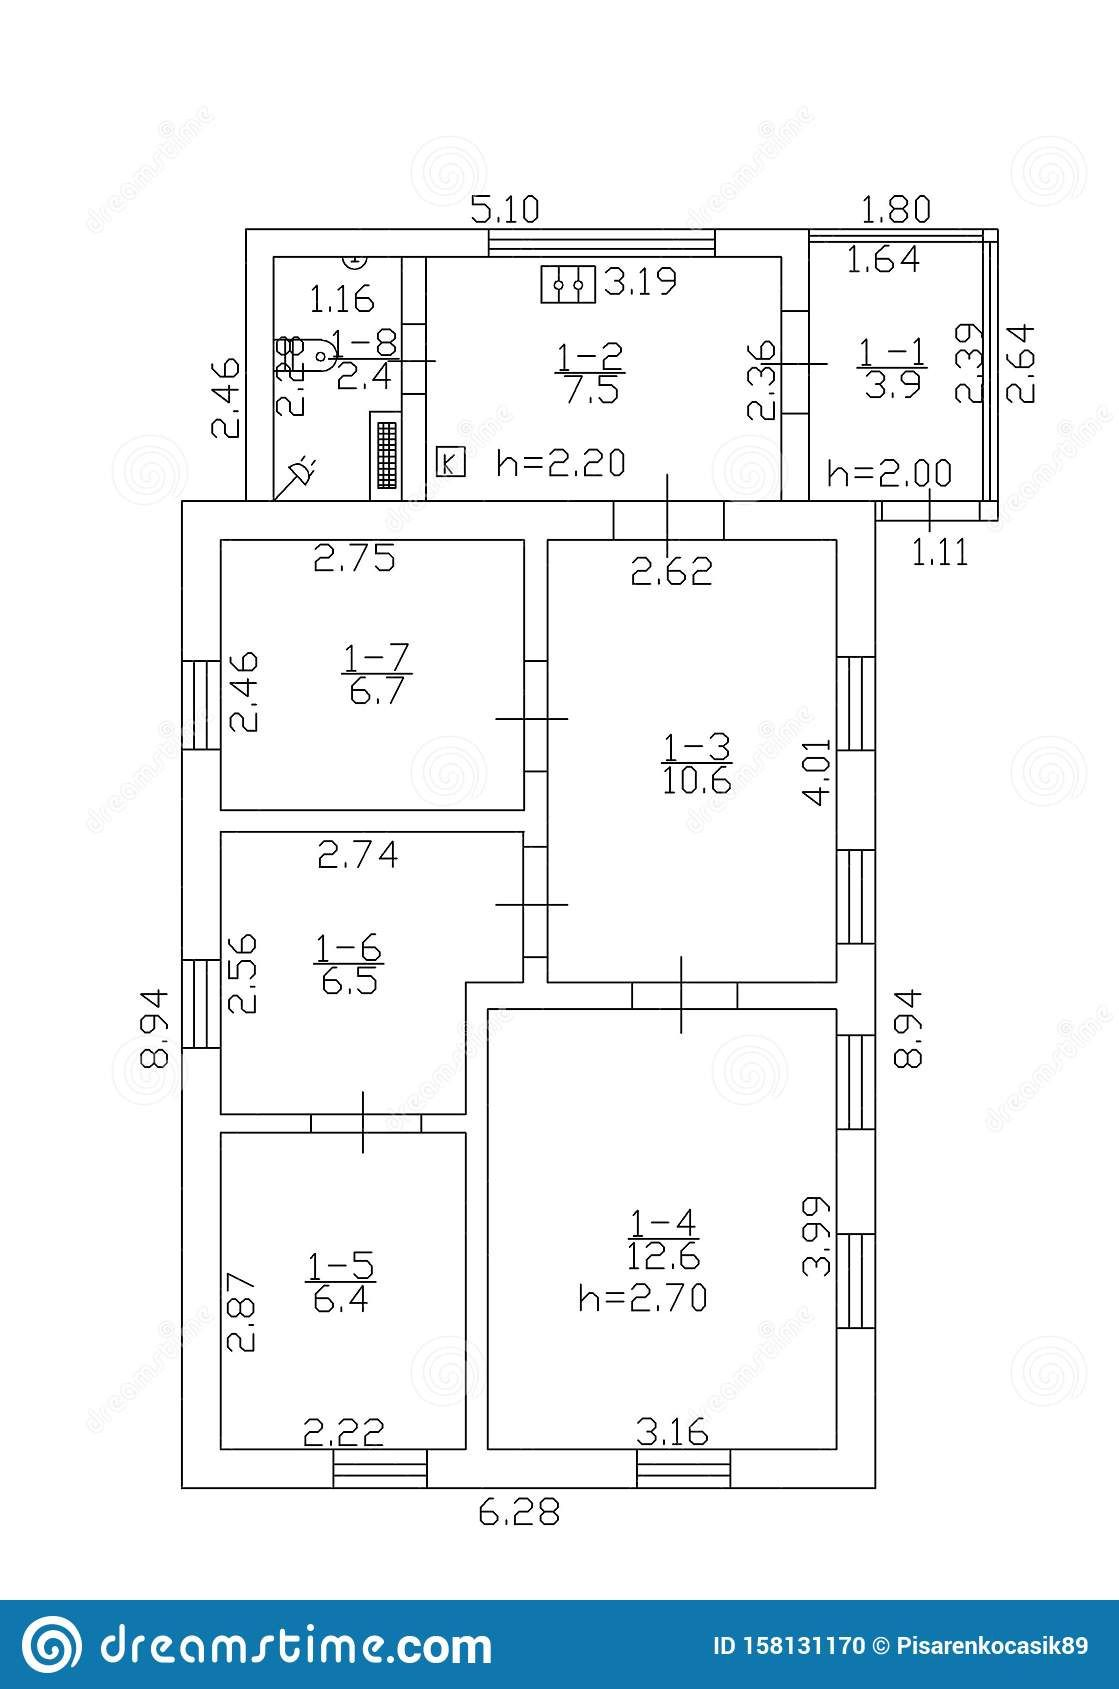 Floorplan Illustration Floor Plan Autocad Stock House Plans Free House Design How To Plan